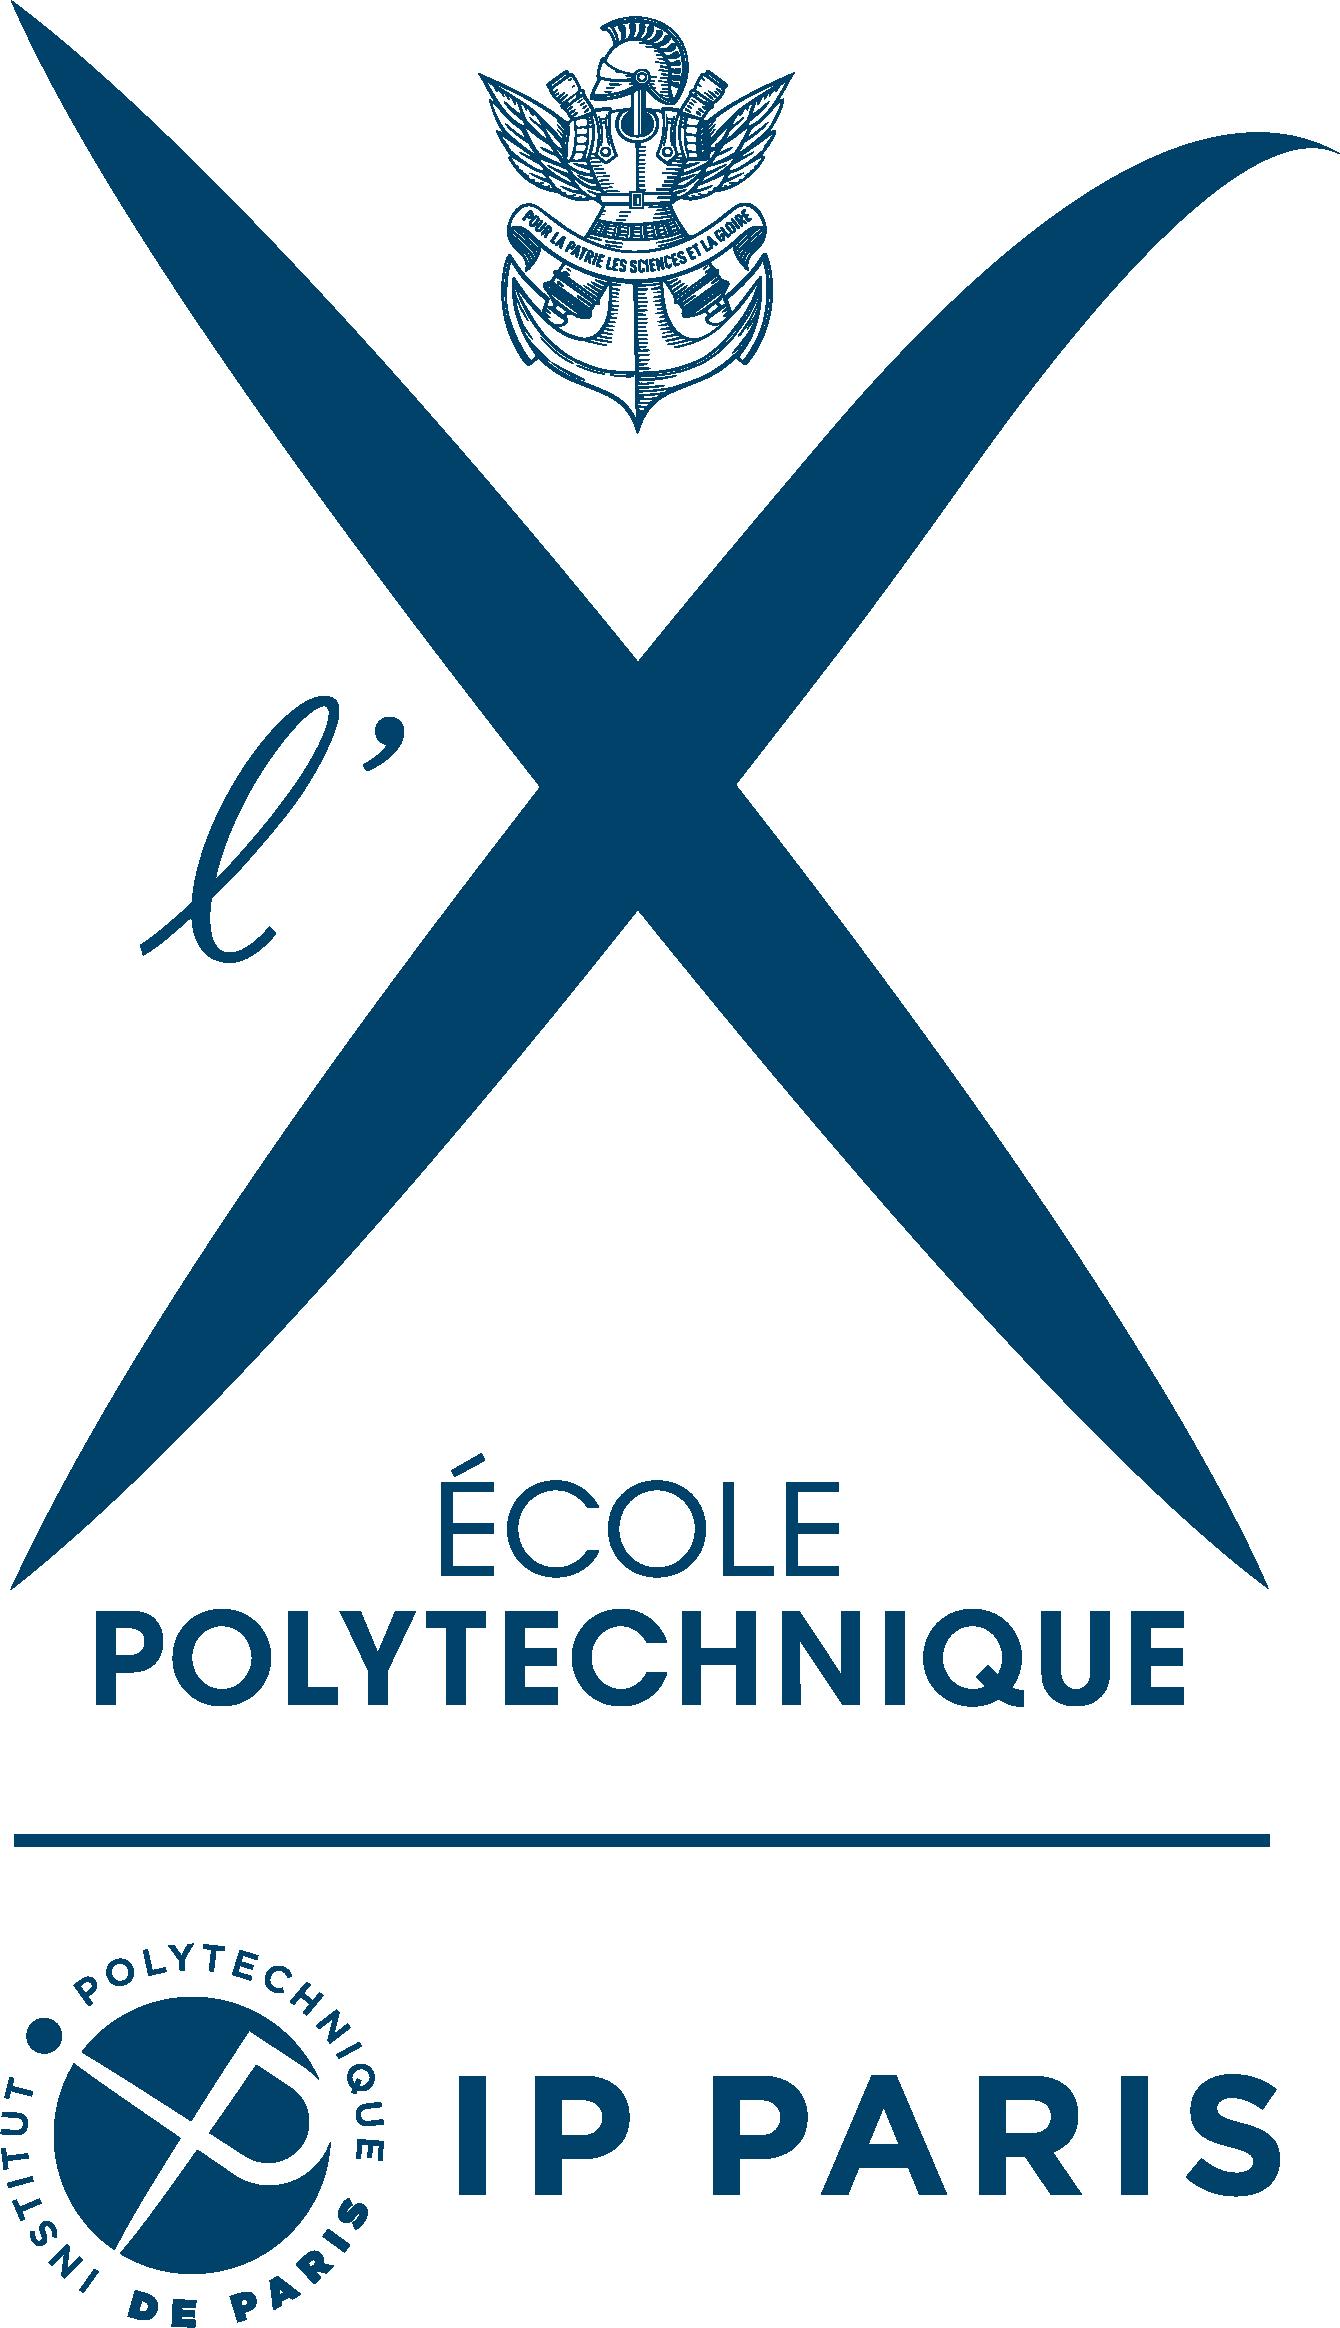 École Polytechnique - Wikipedia